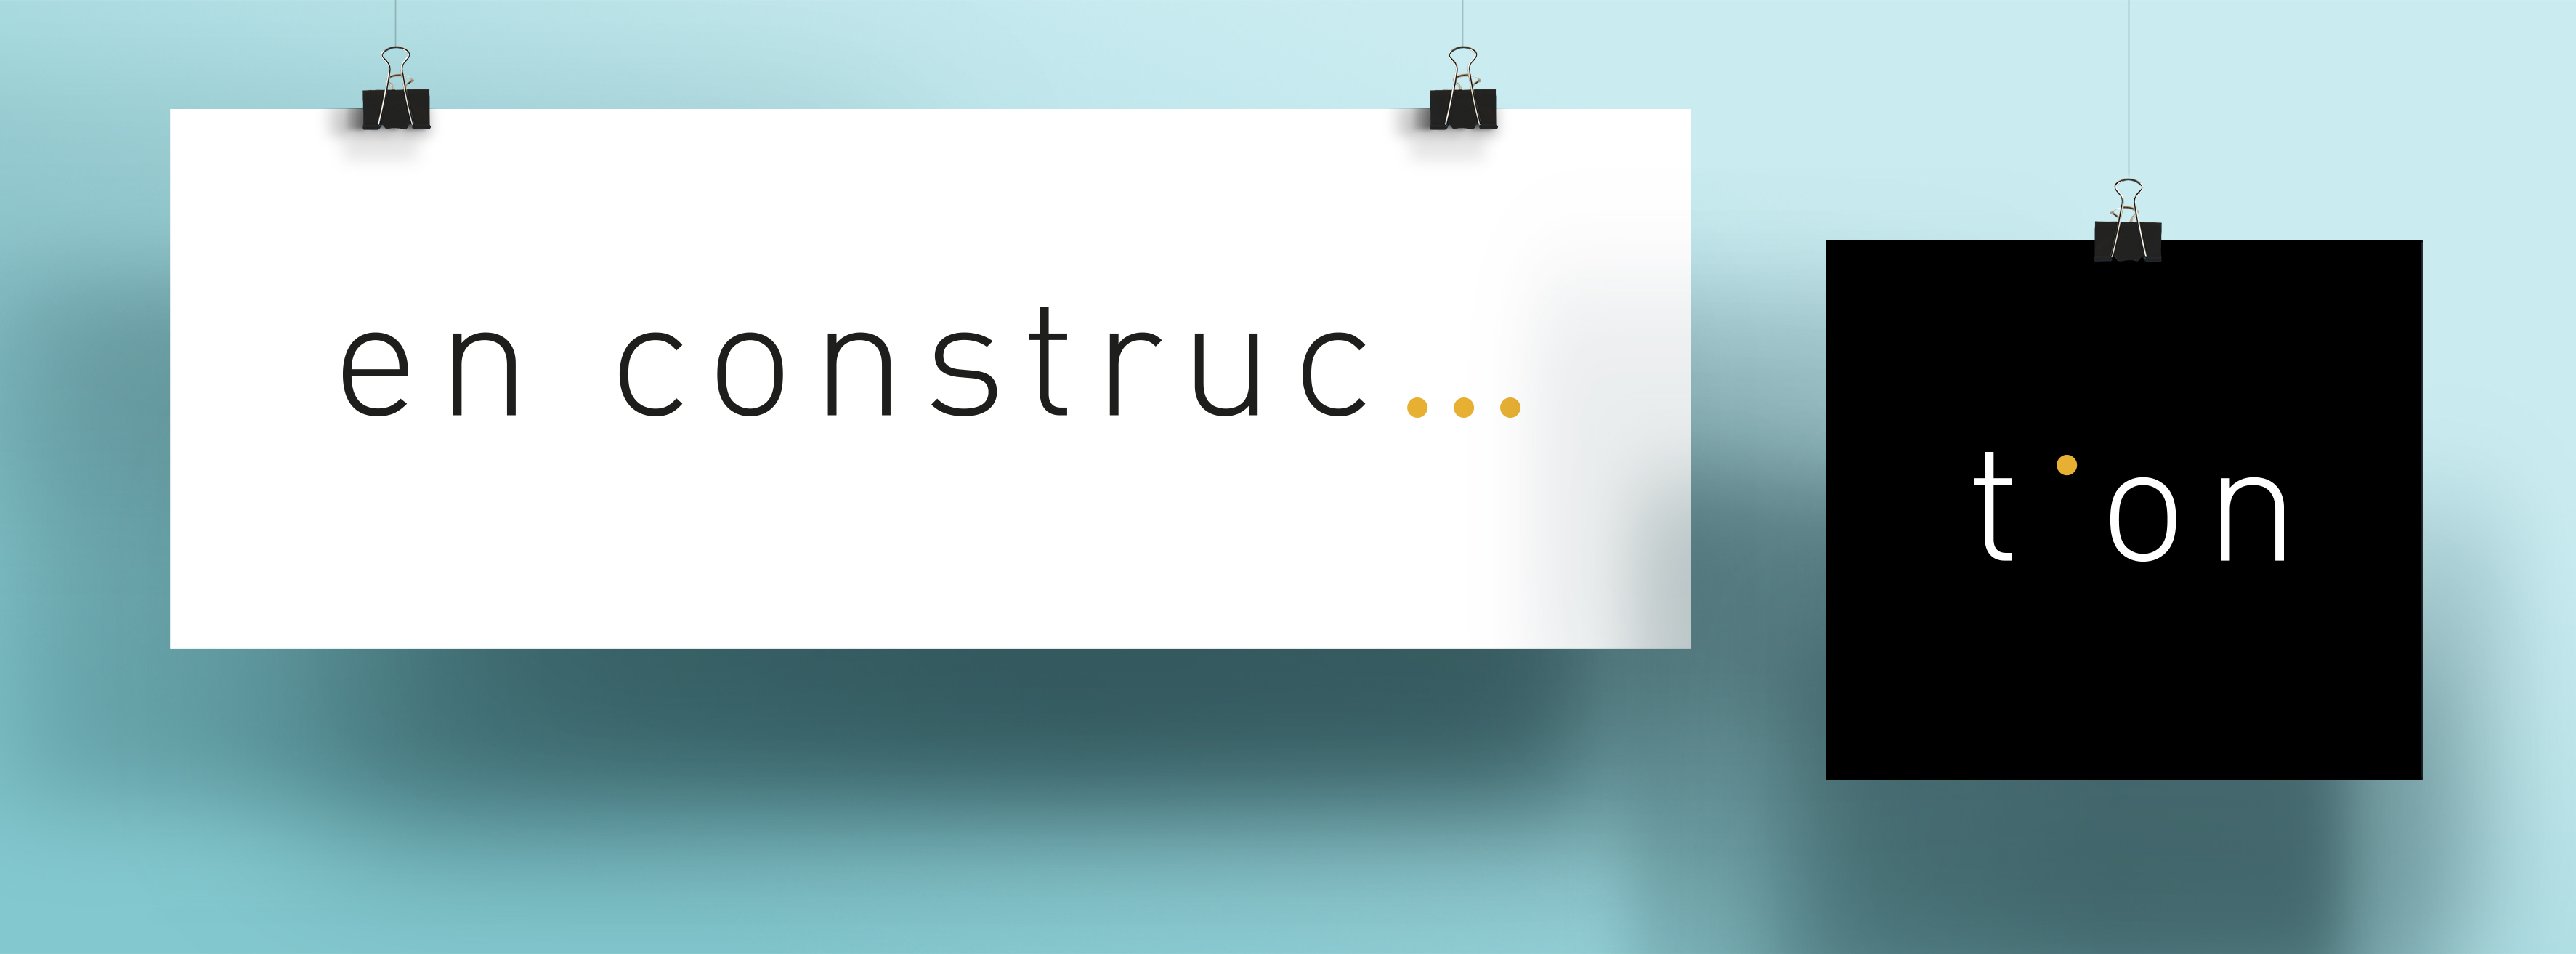 site-intro-en construction2